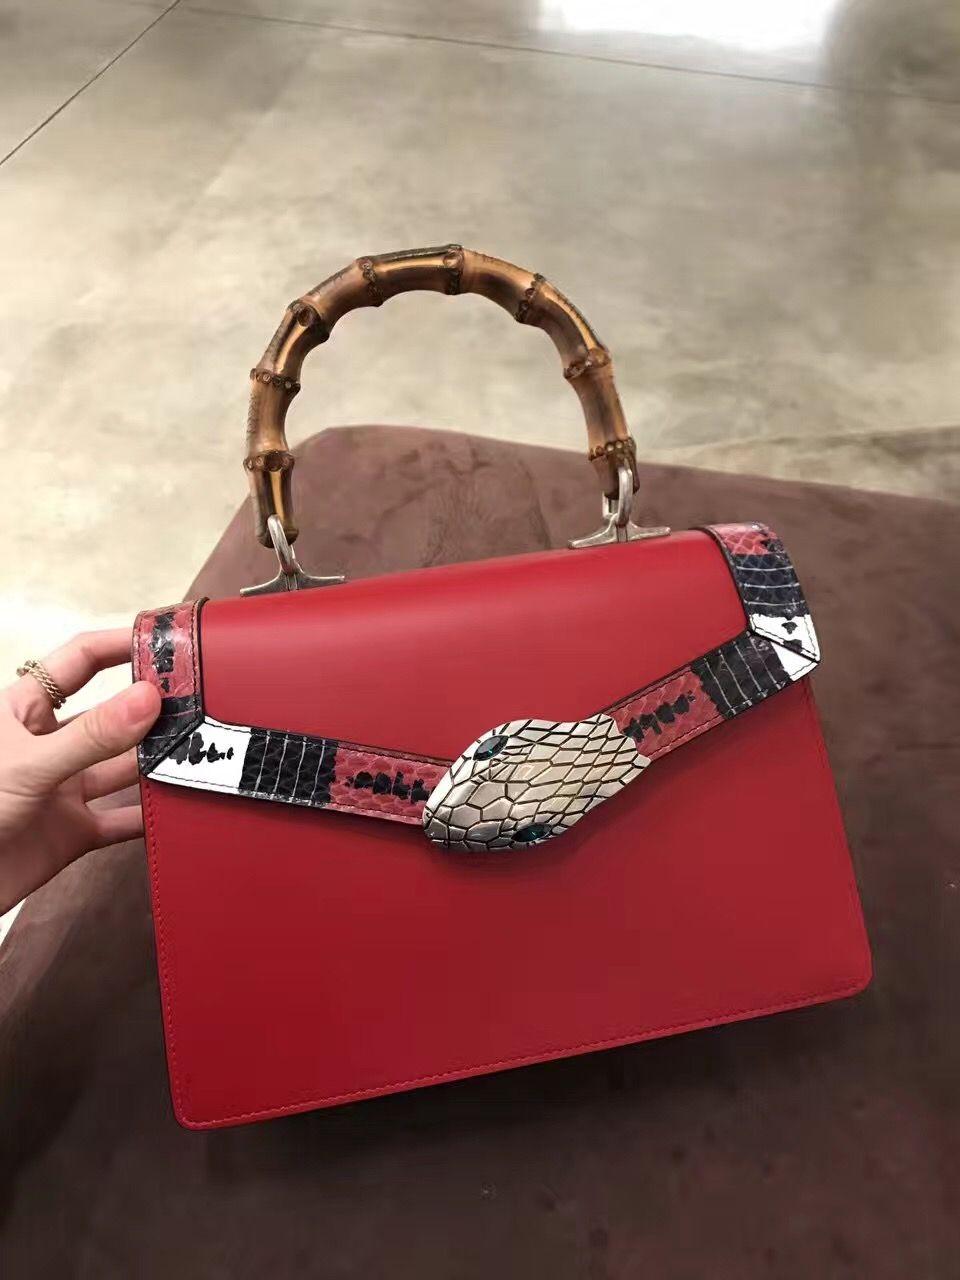 23f9e284687 Gucci snake head bamboo handle bag 453750 #gucci #handle # bag #453750  #bamboo